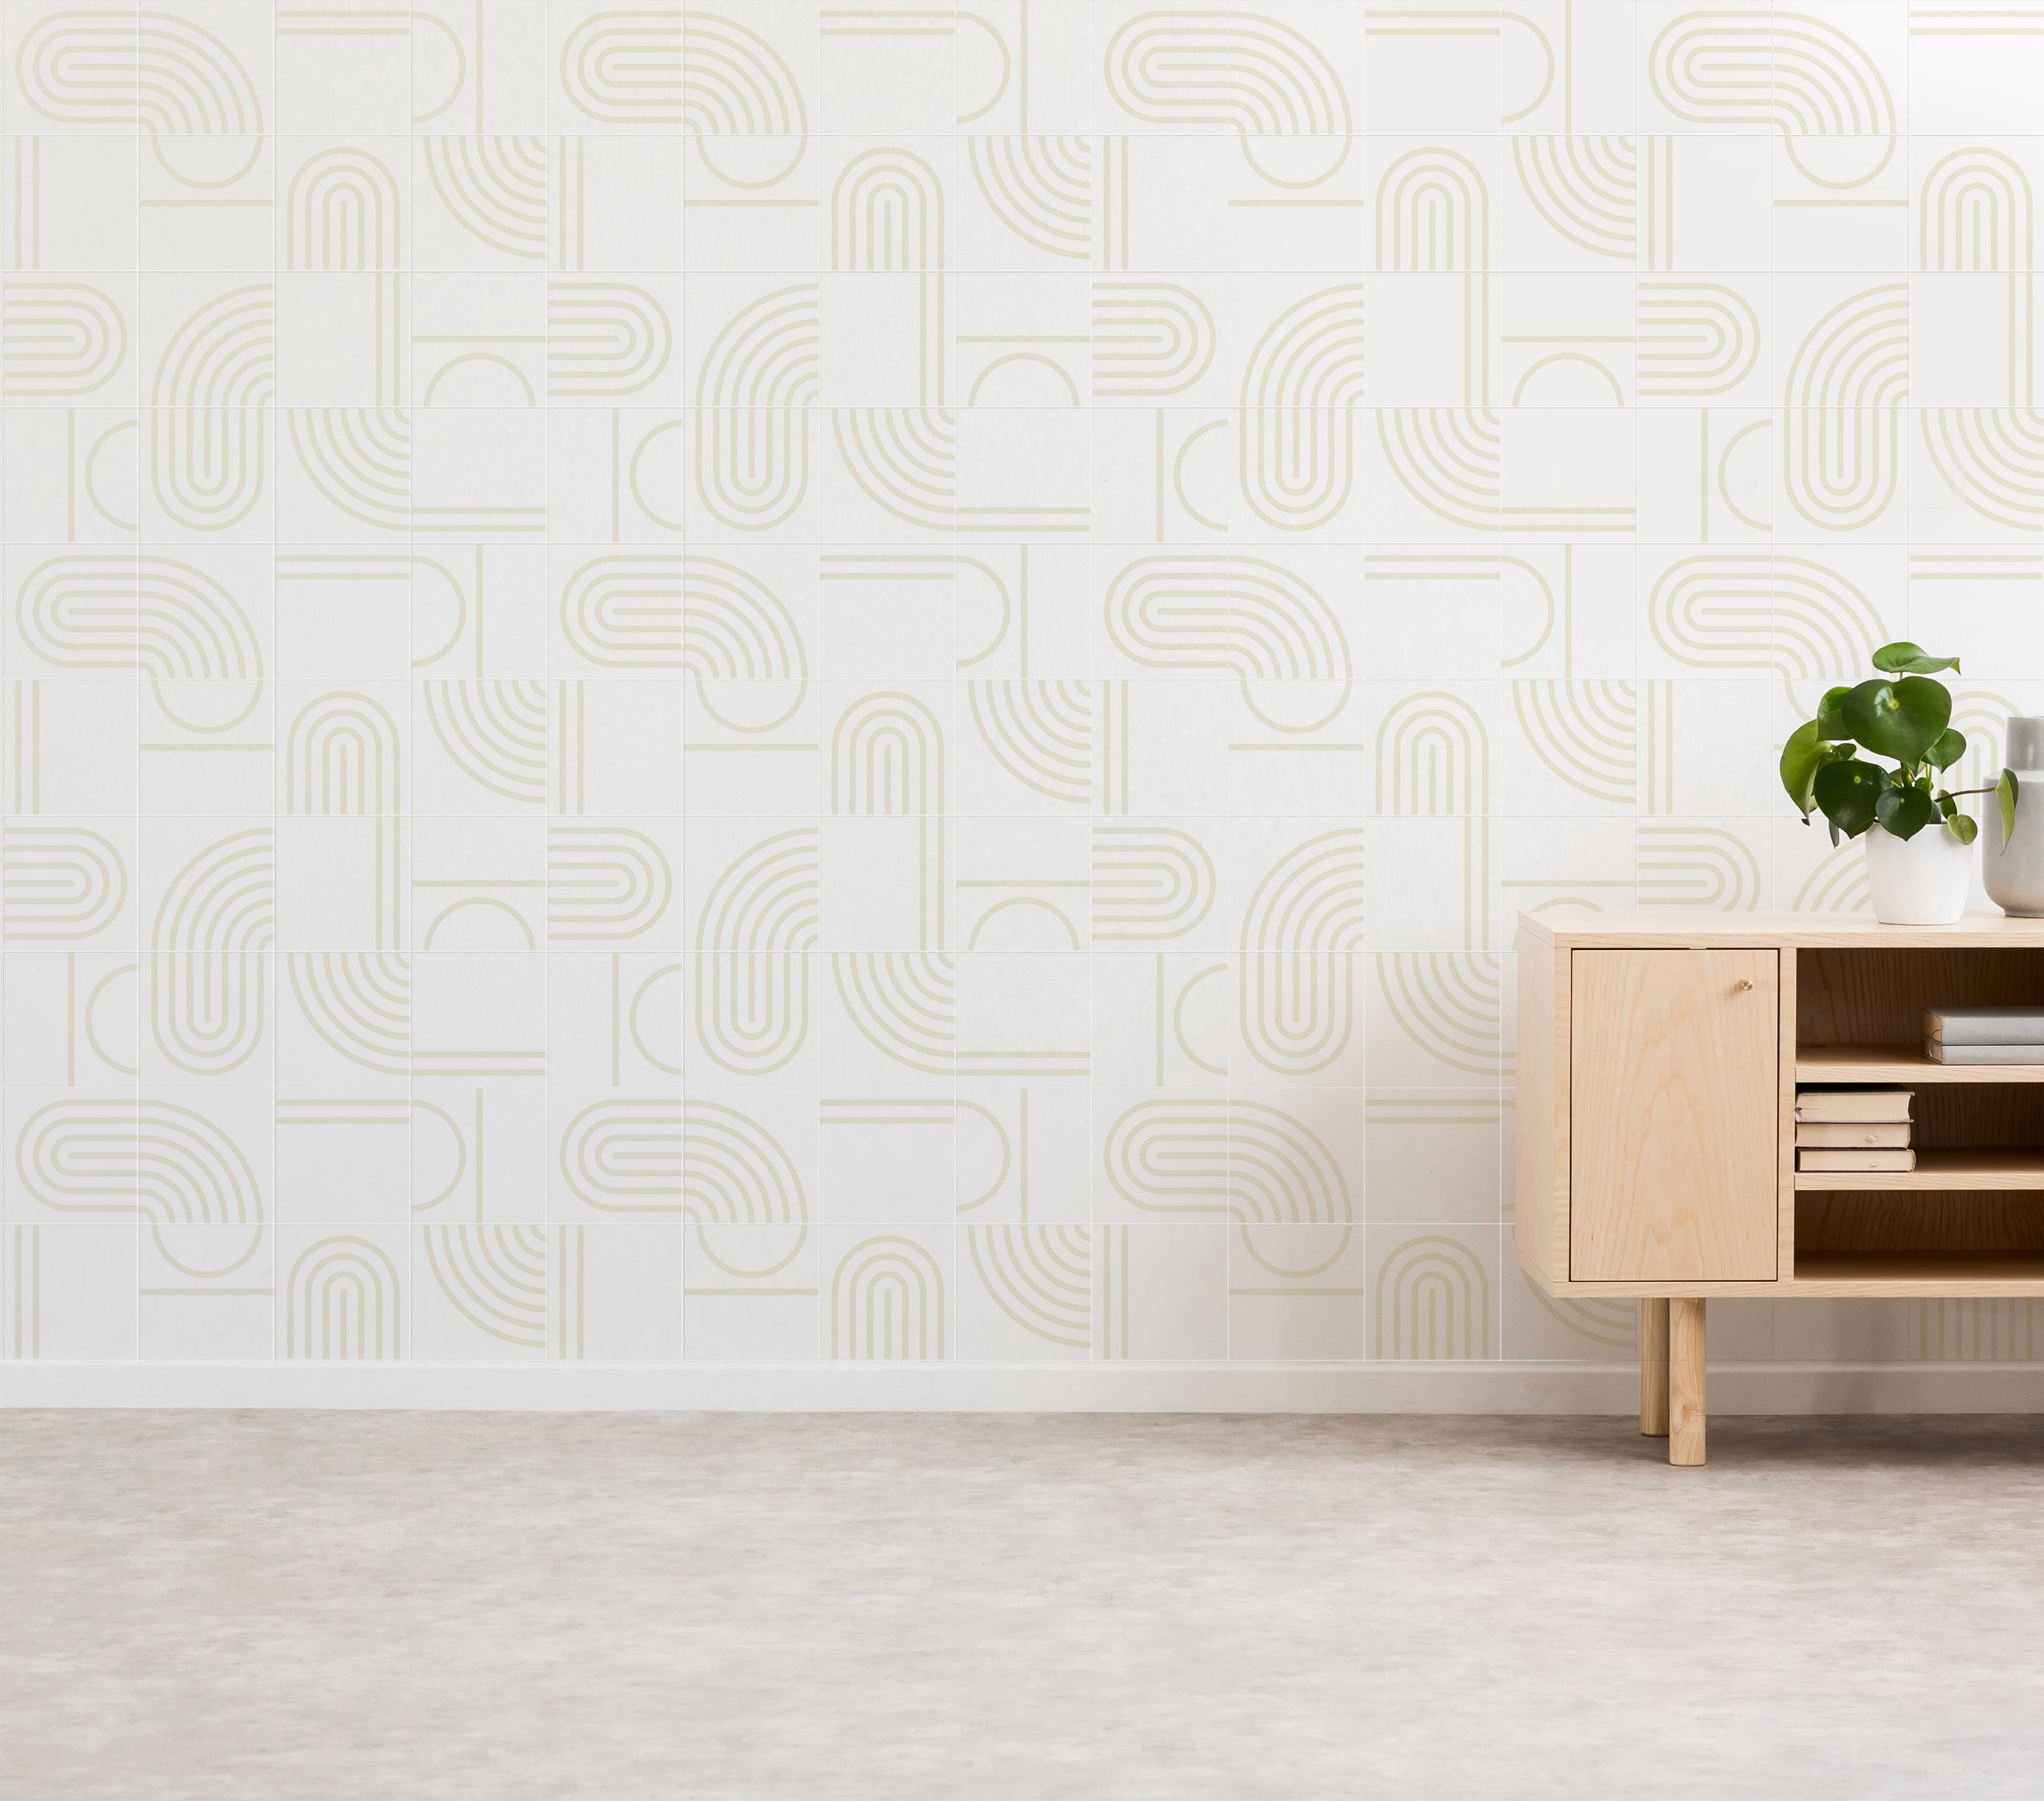 Painel Bauhaus cor areia